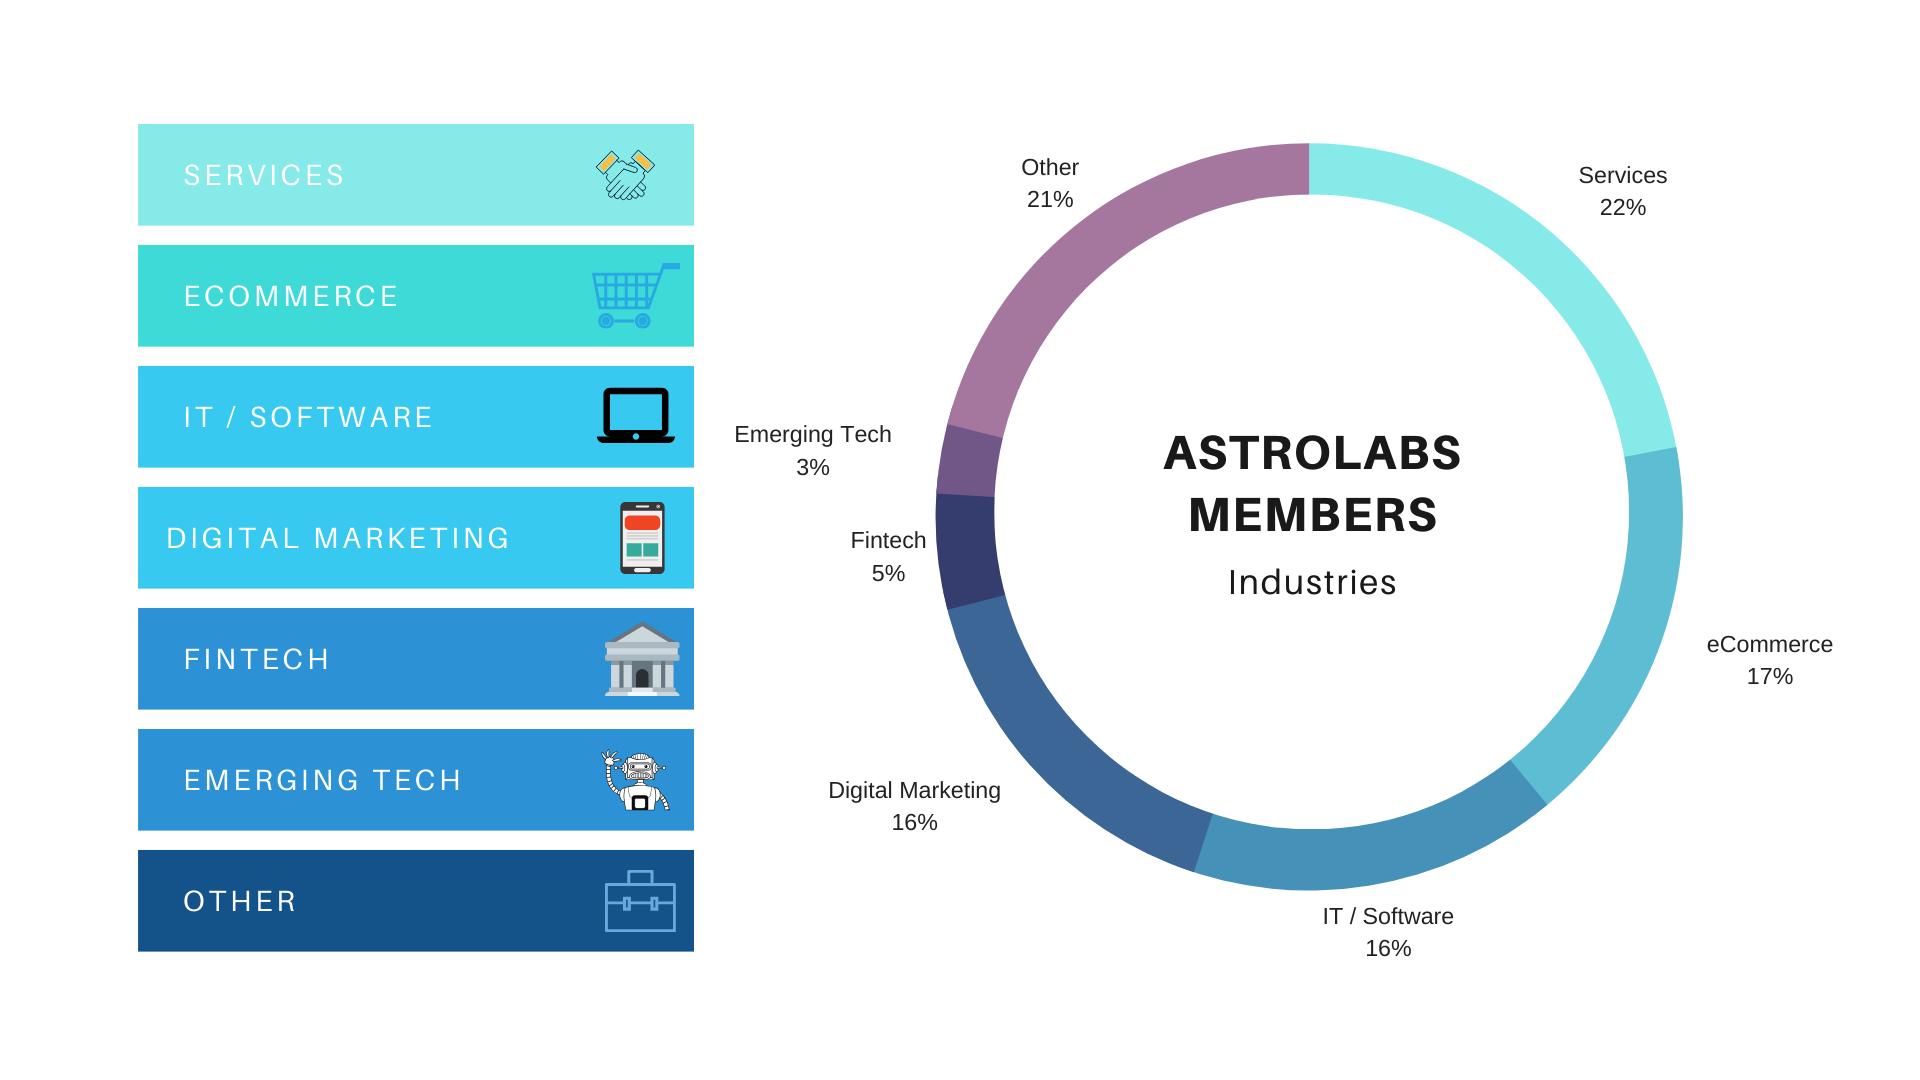 AstroLabs Members Dubai Coworking Industries